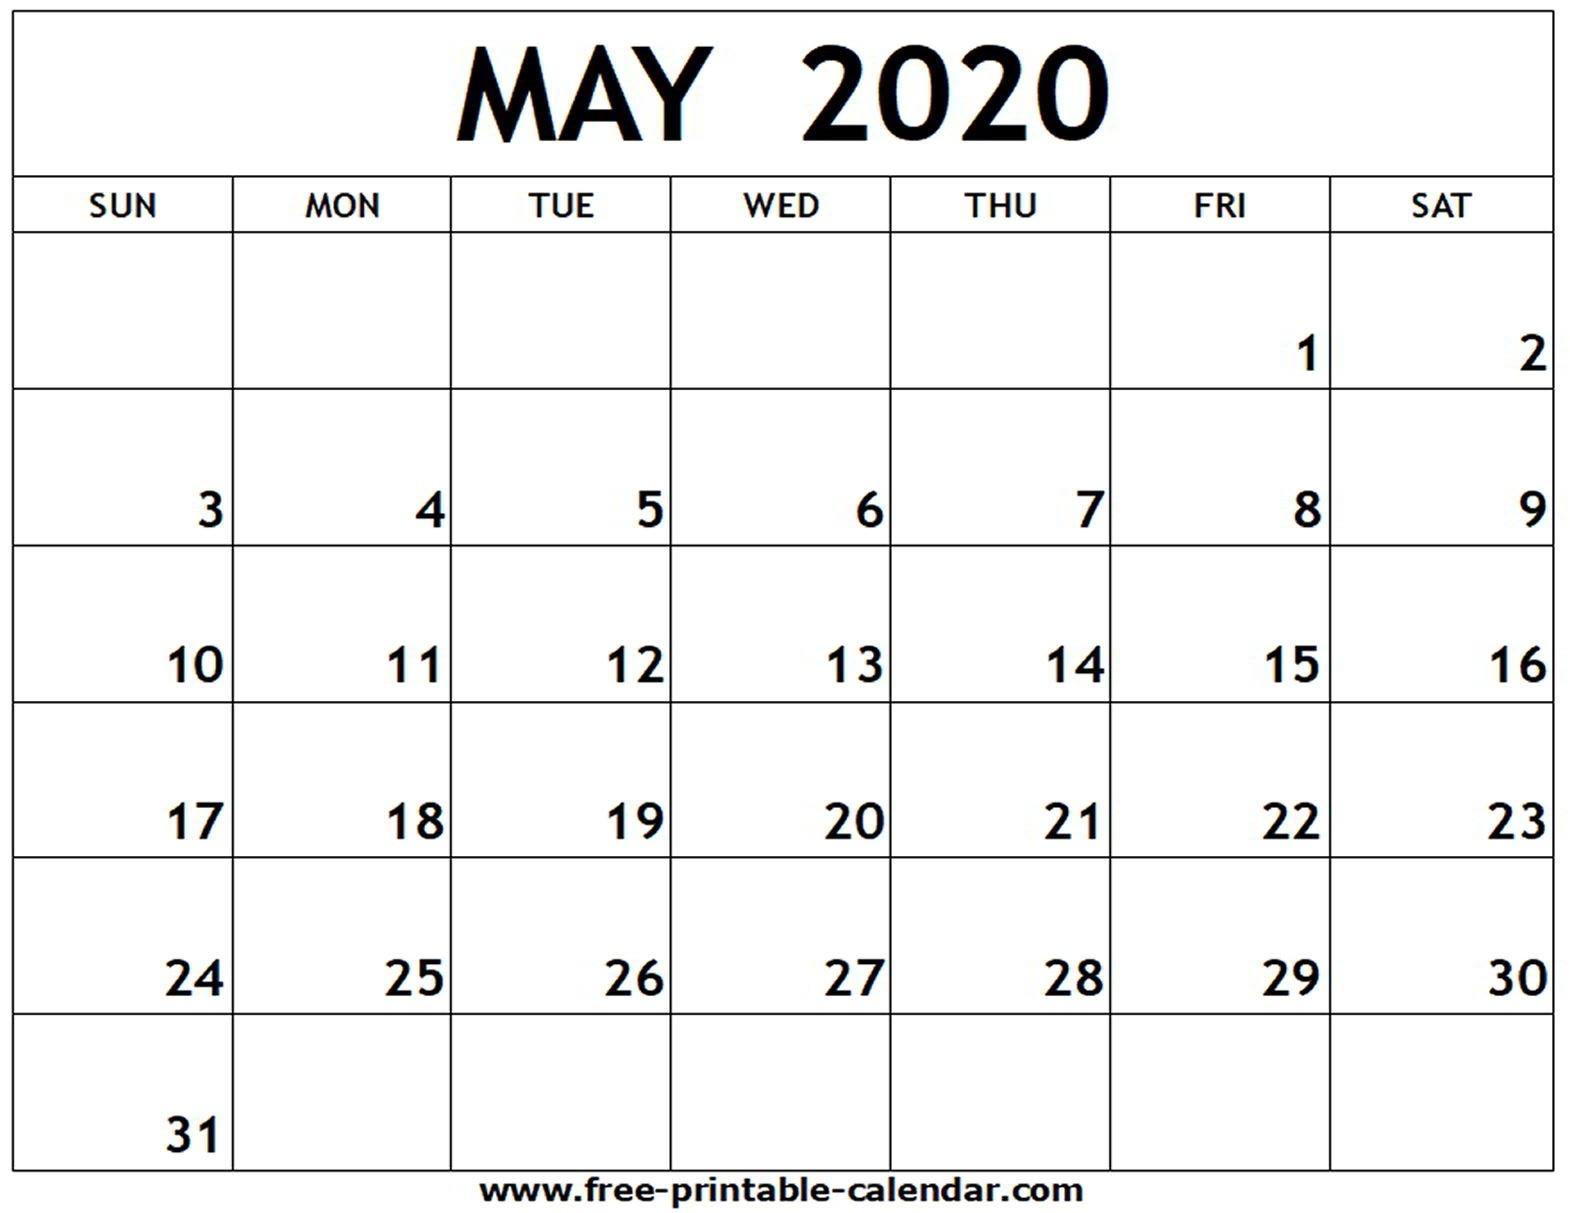 May 2020 Printable Calendar - Free-Printable-Calendar-Blank Calandar Of Events 2020